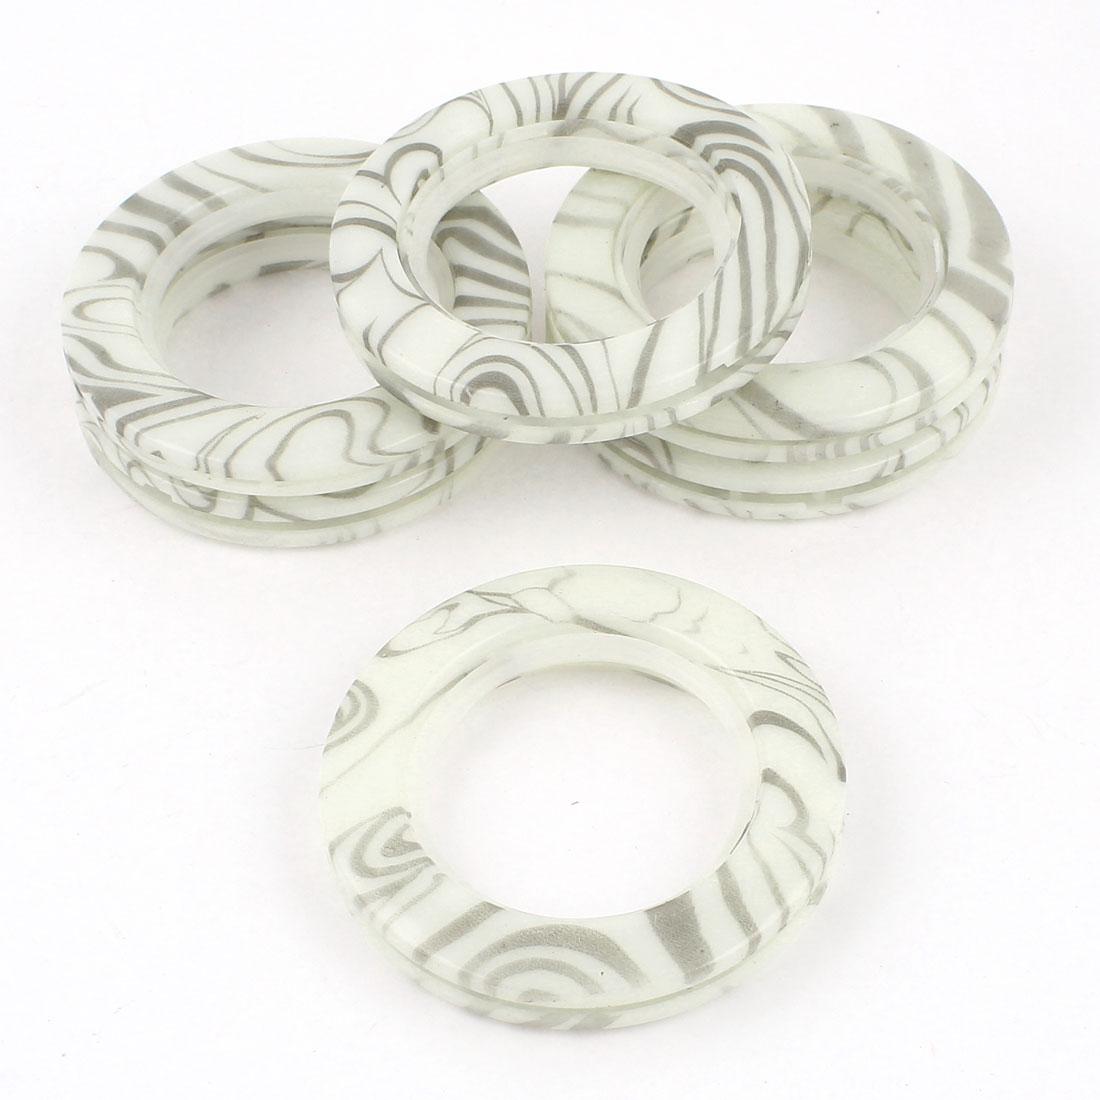 6 Pcs Round Shape Gray White Plastic Curtain Rings 44mm Inner Dia